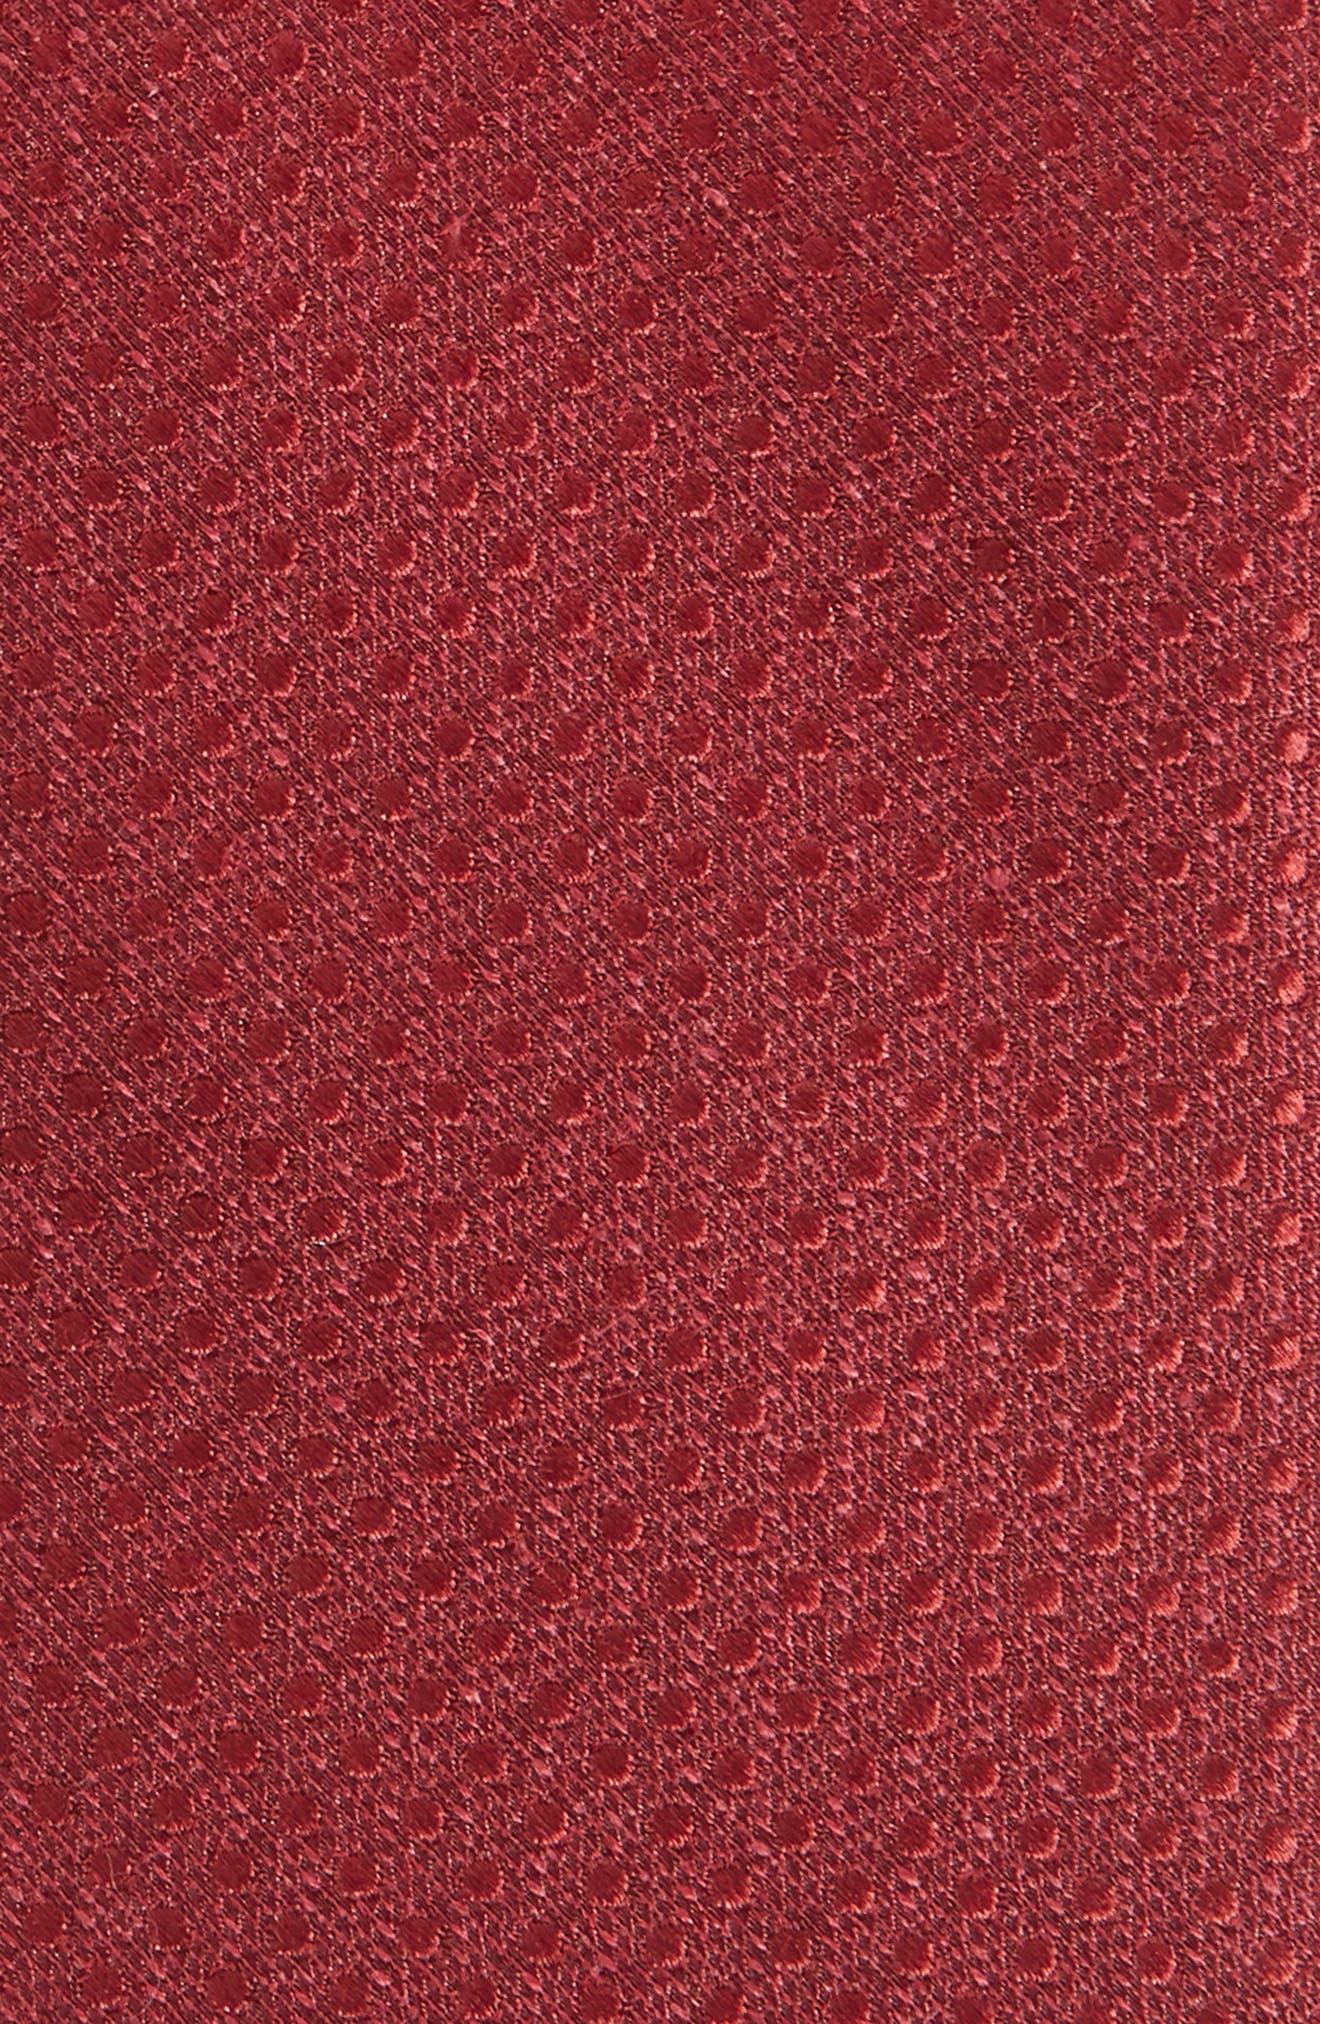 Spin Dot Silk & Cotton Tie,                             Alternate thumbnail 2, color,                             Burgundy